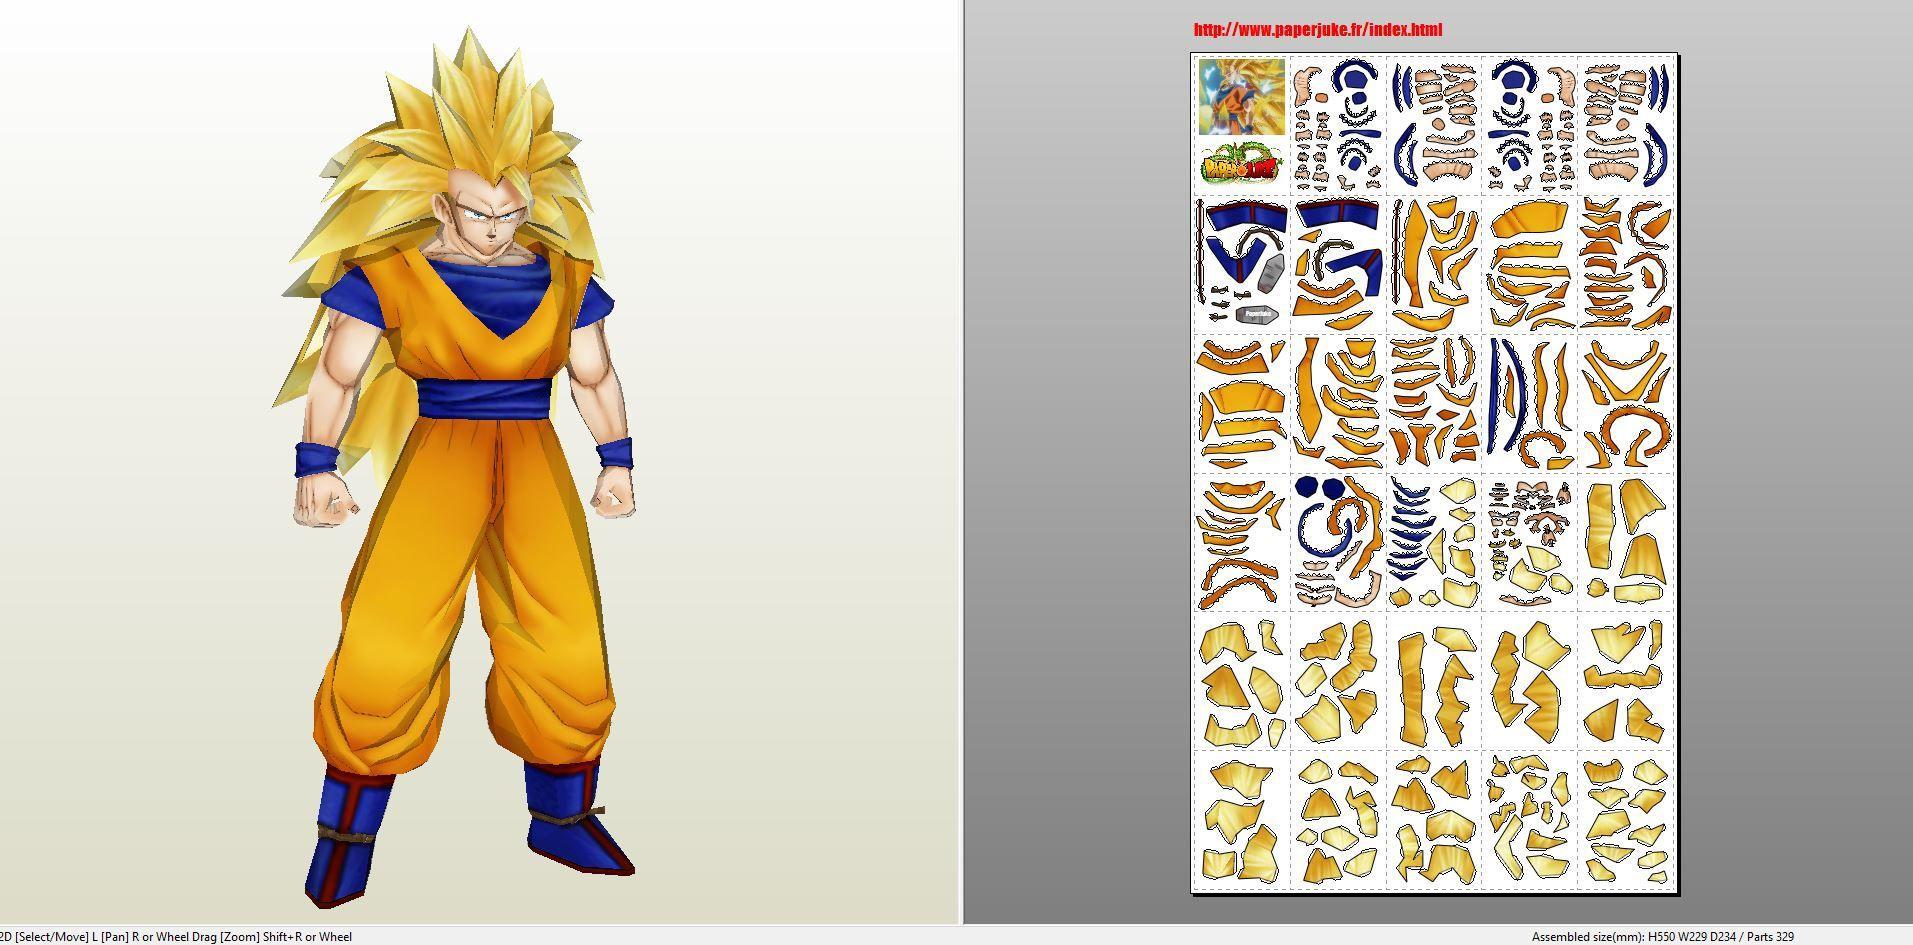 Papercraft  pdo file template for Dragonball Z - Son Goku